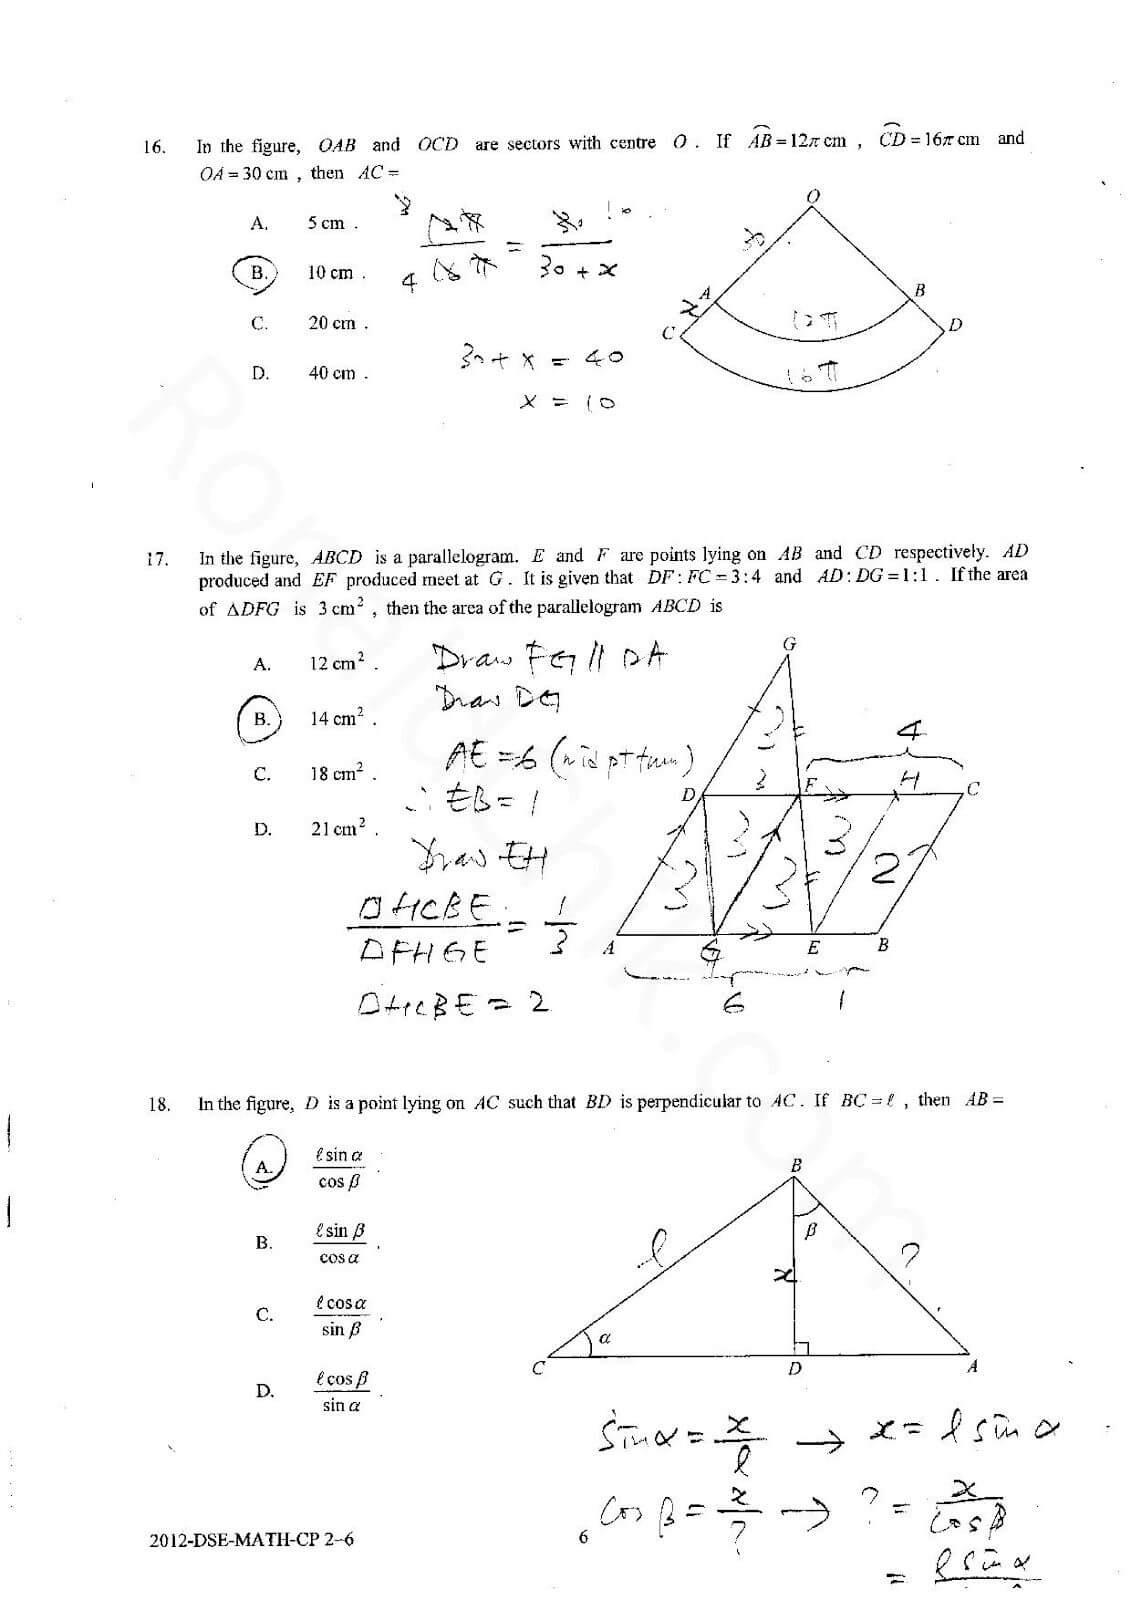 2012 DSE Math P2 卷二 Q16,17,18